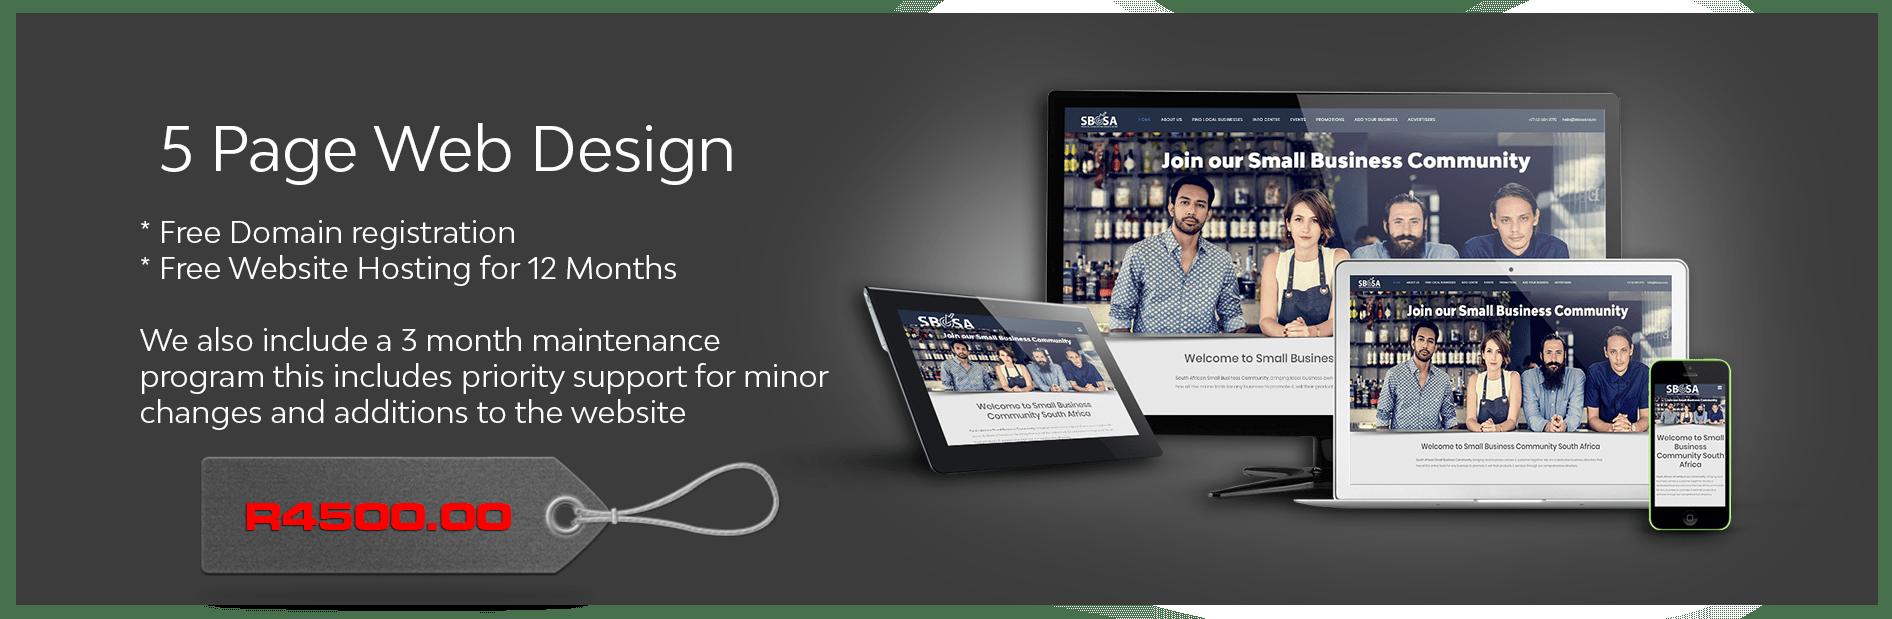 5 Pages of good website design